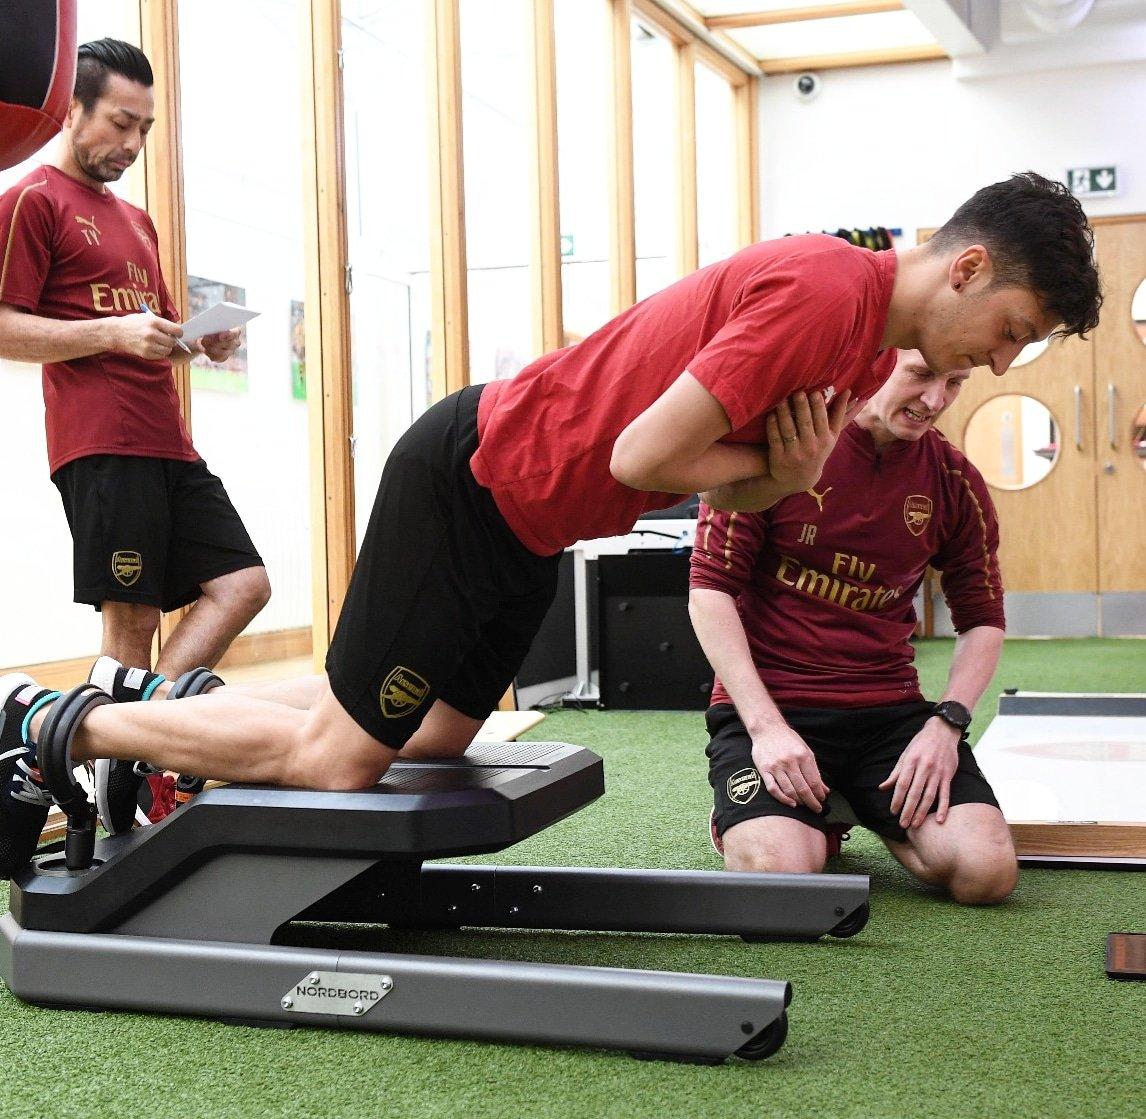 No matter what ... put in the work 💪🏼 #M1Ö #YaGunnersYa @Arsenal